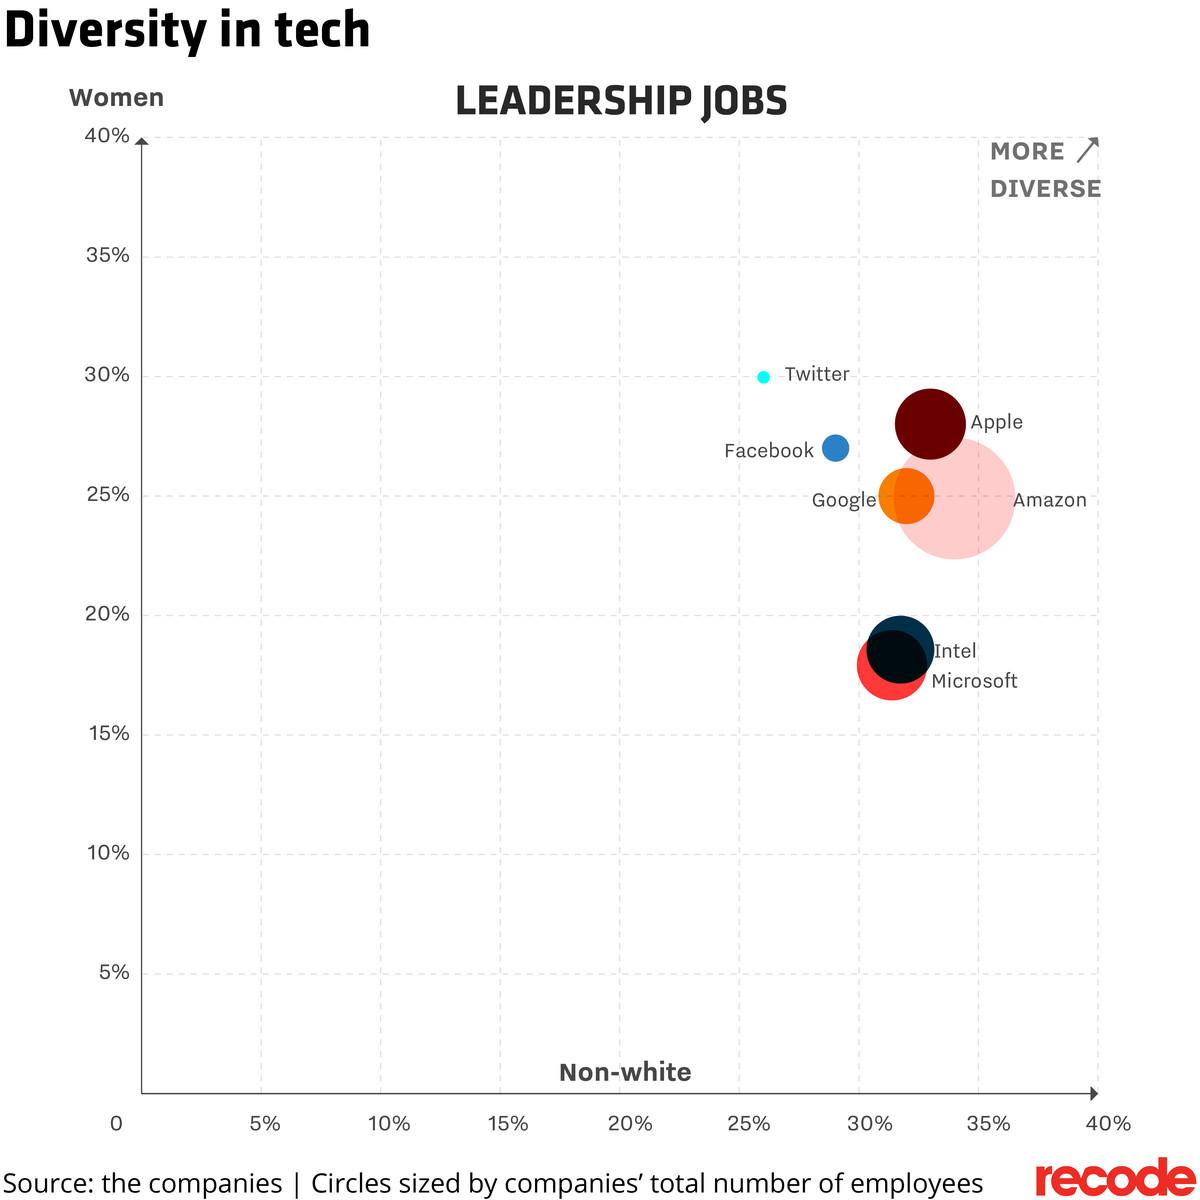 Diversity in technology leadership